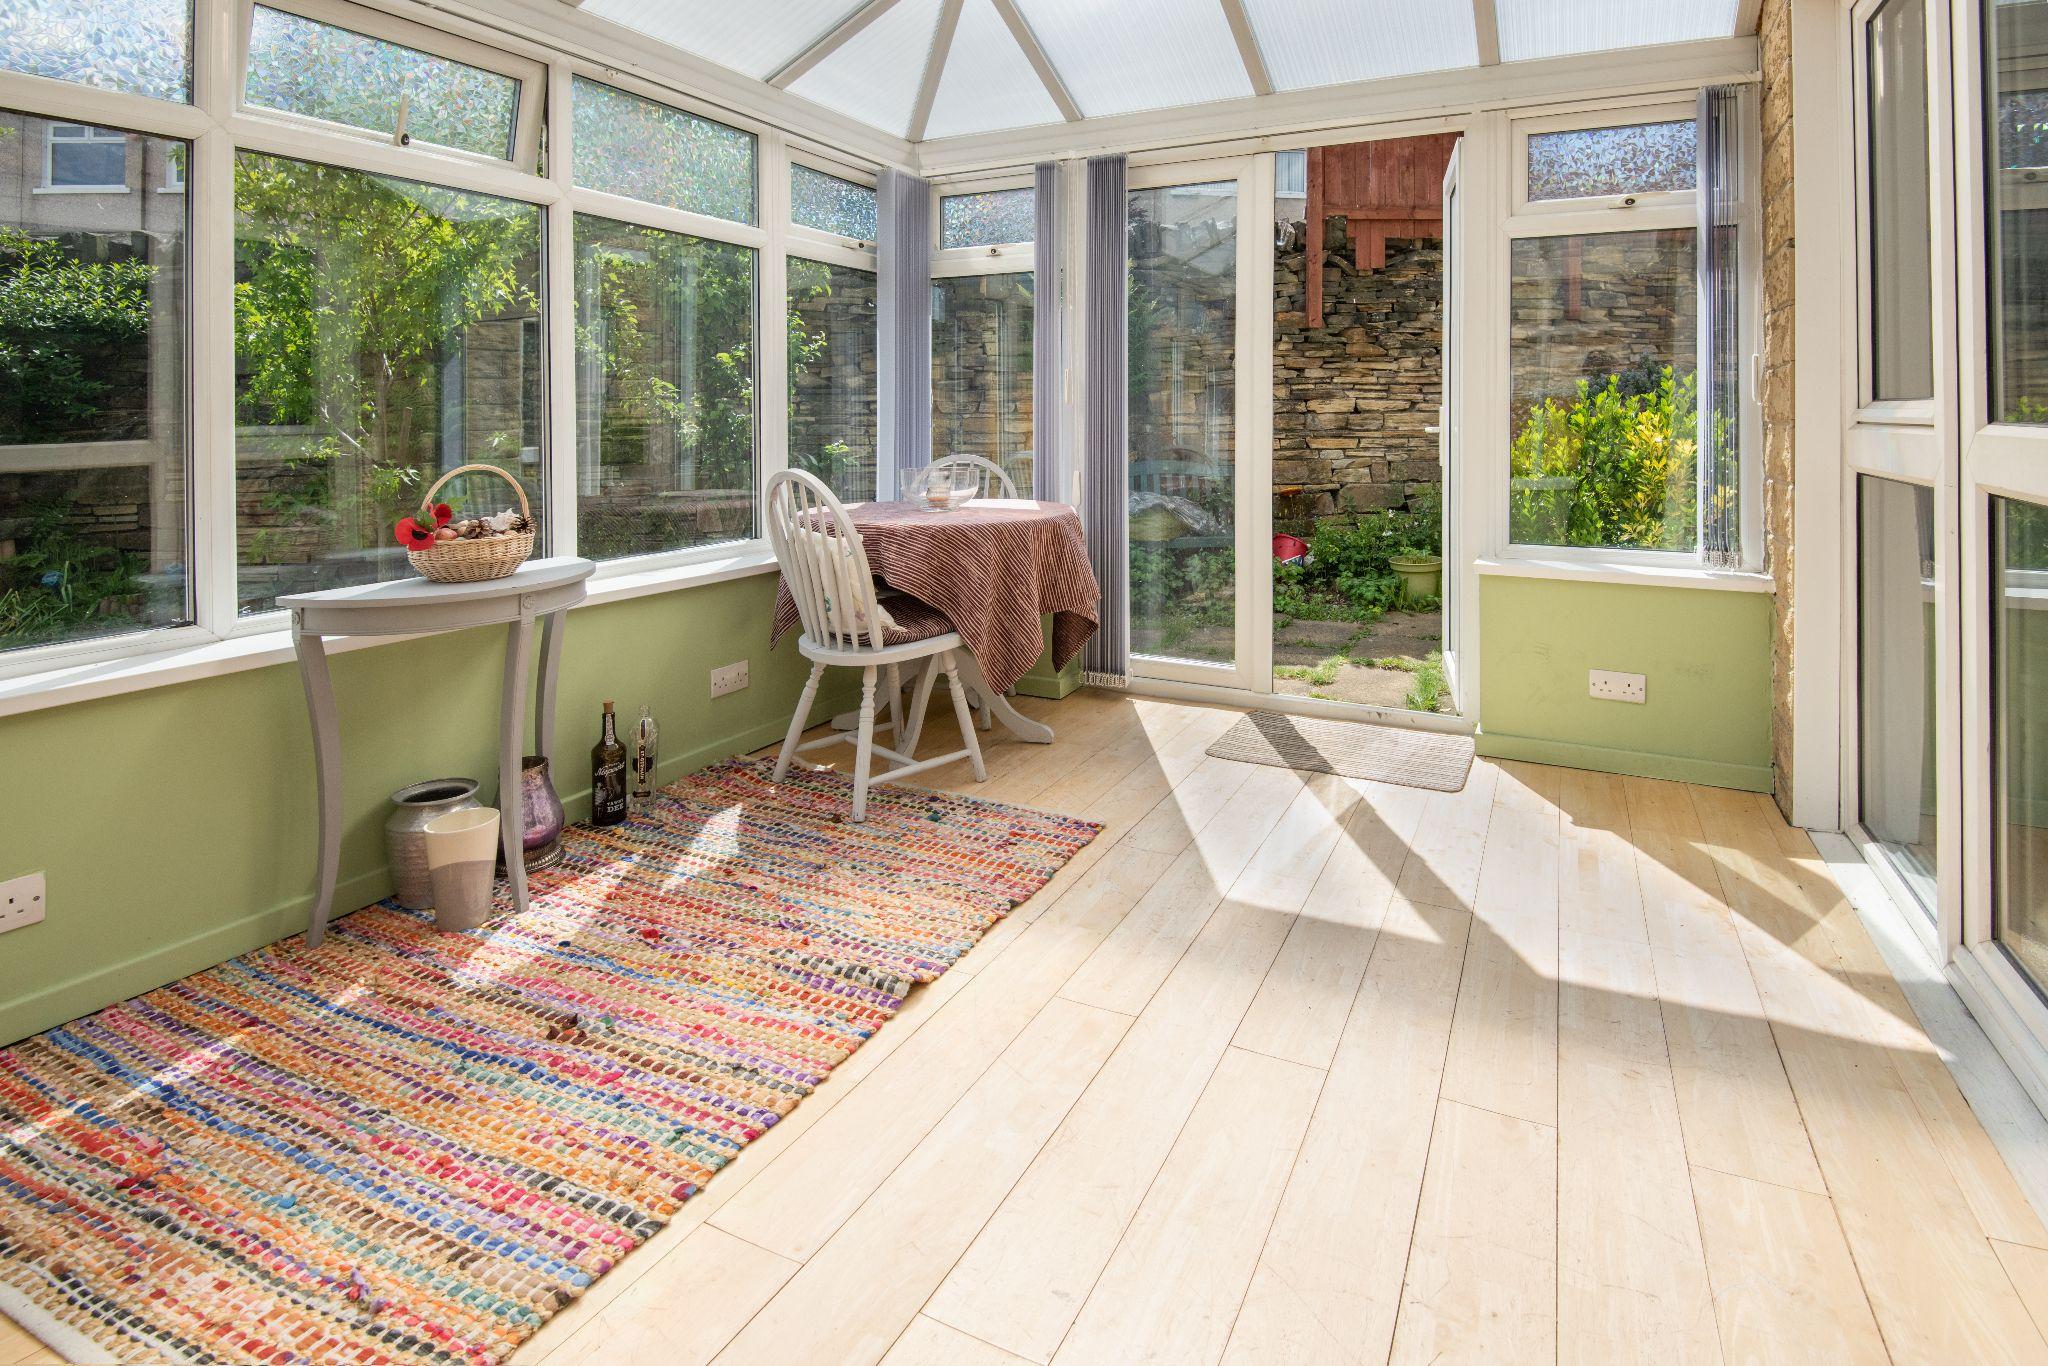 4 Bedroom Detached House For Sale - Conservatory